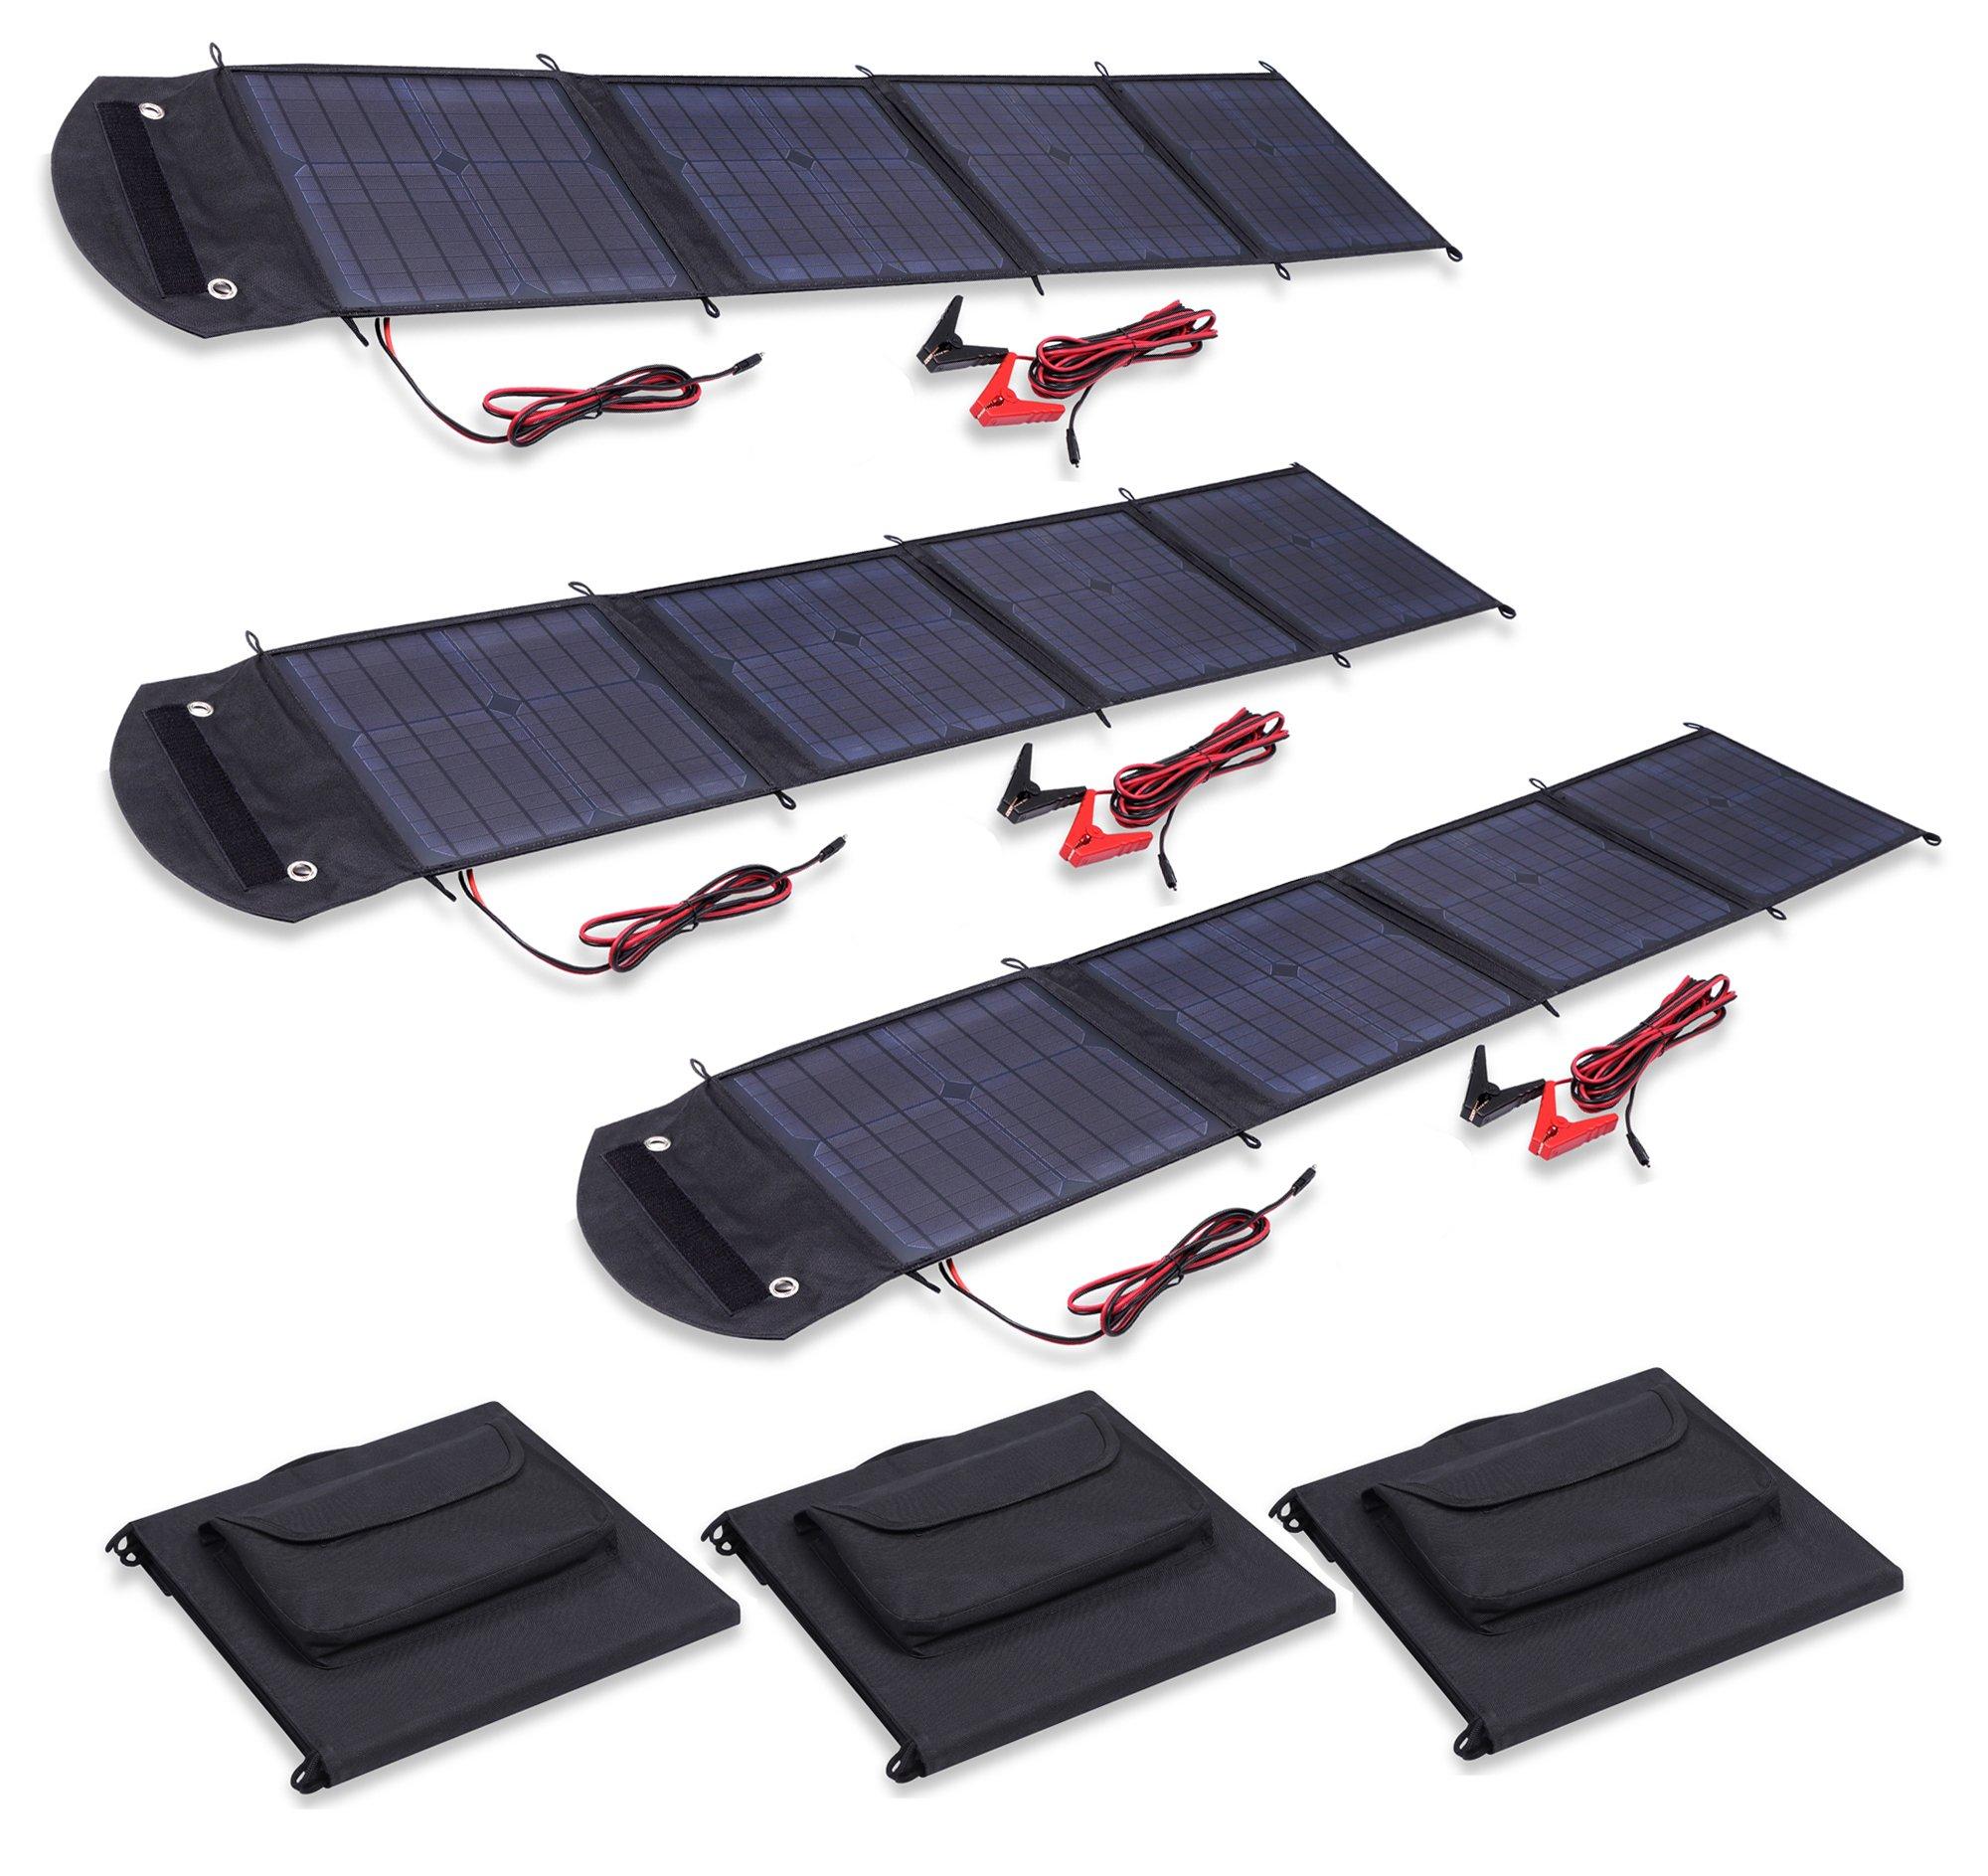 Visua VSSP 500W High Power Fold Up Portable Solar Panel Battery Charger  Kits For Caravans, Motorhomes 150W Kit